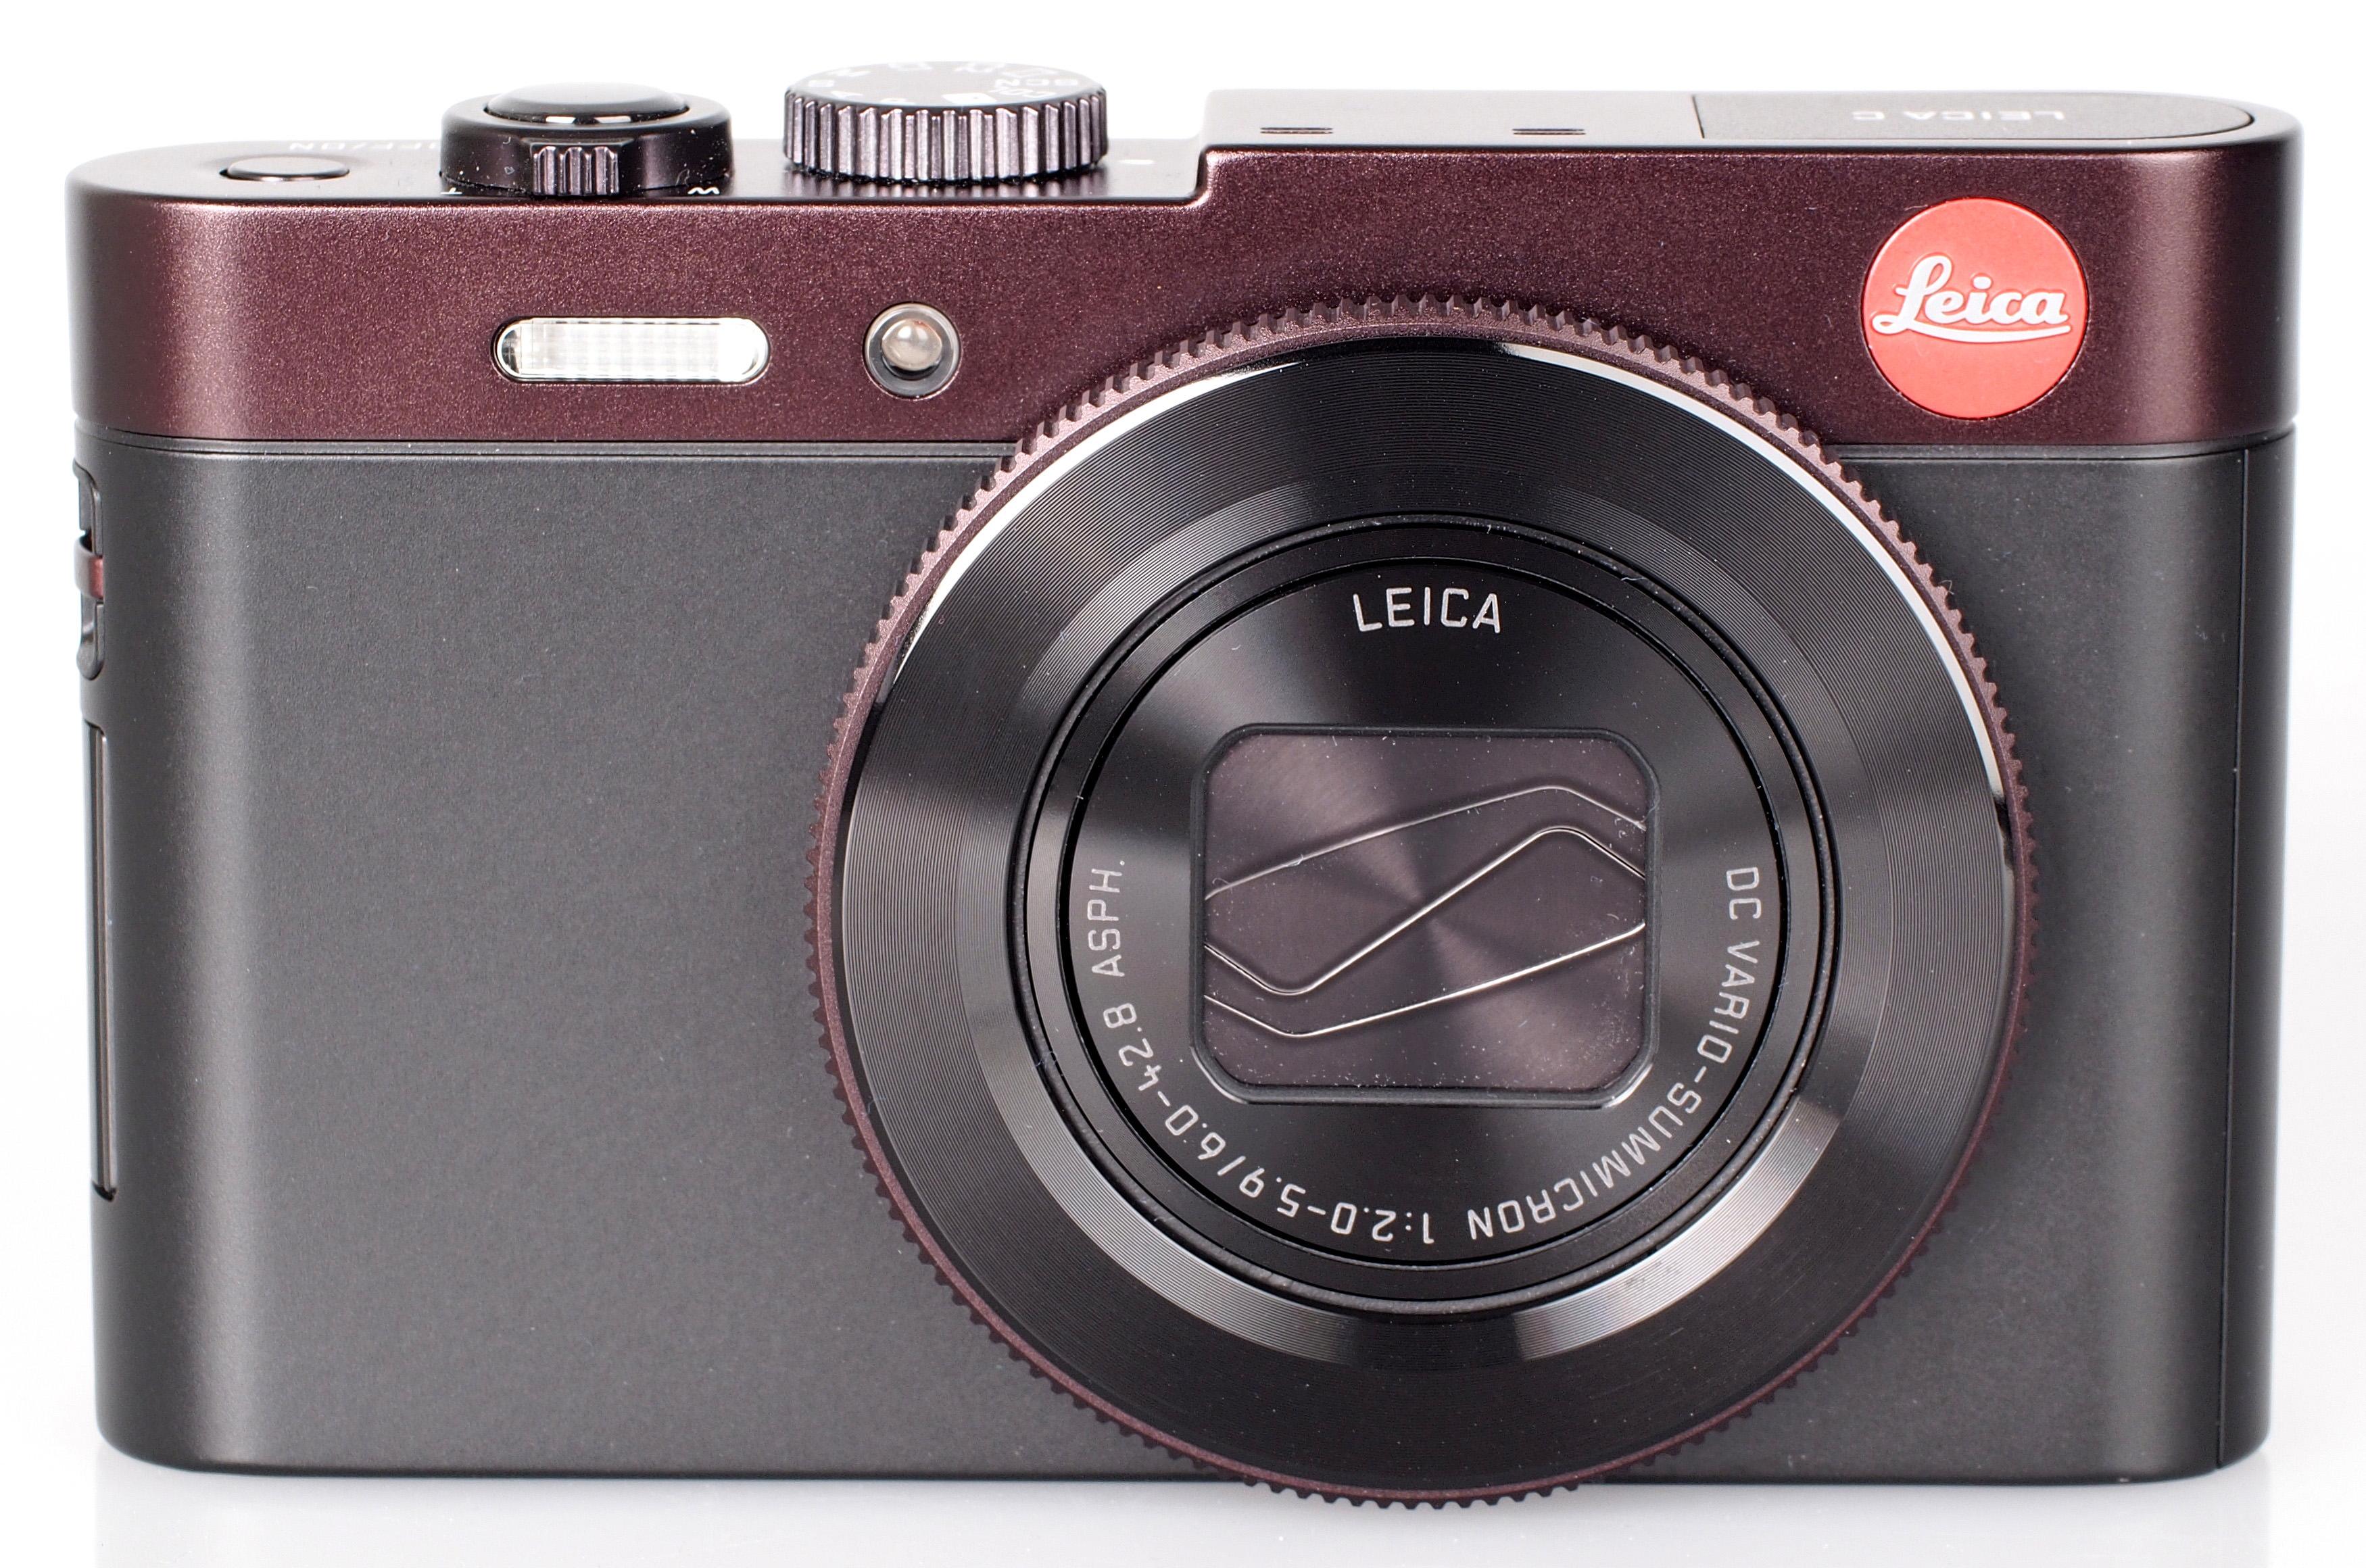 Leica c type 112 manually